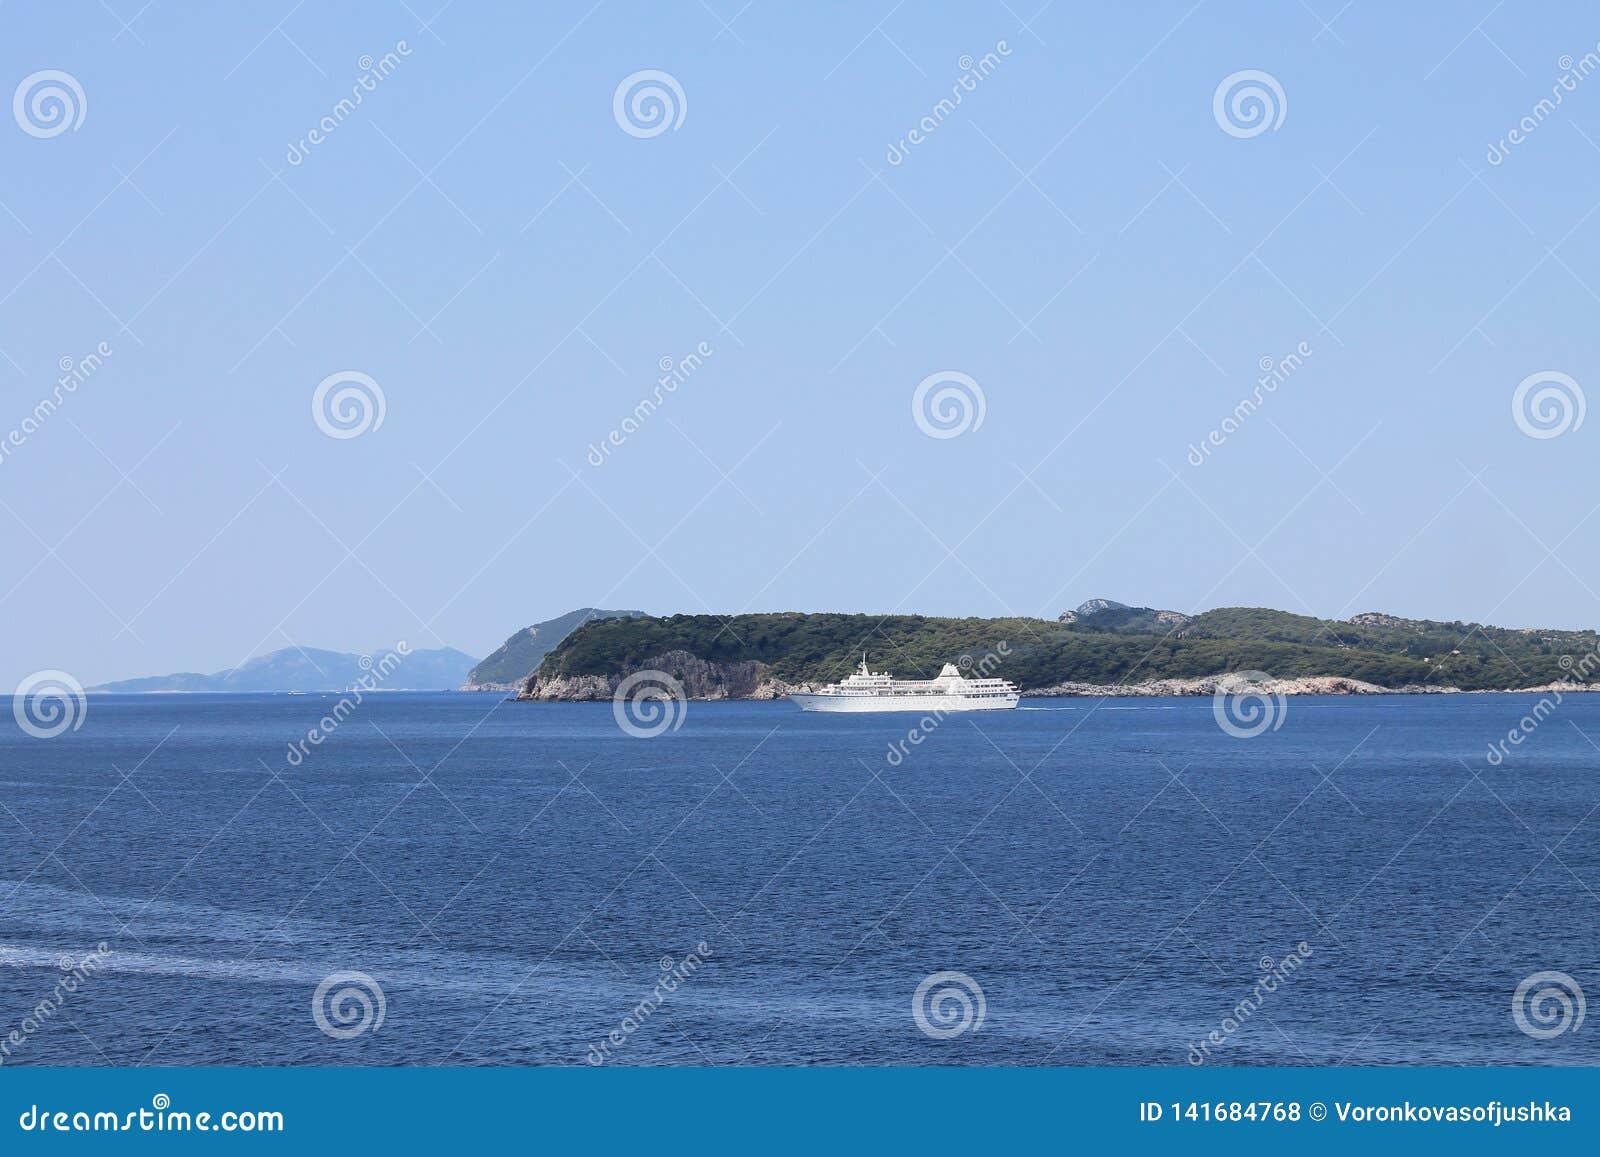 Vista do mar de adriático na península de Lapad da Croácia